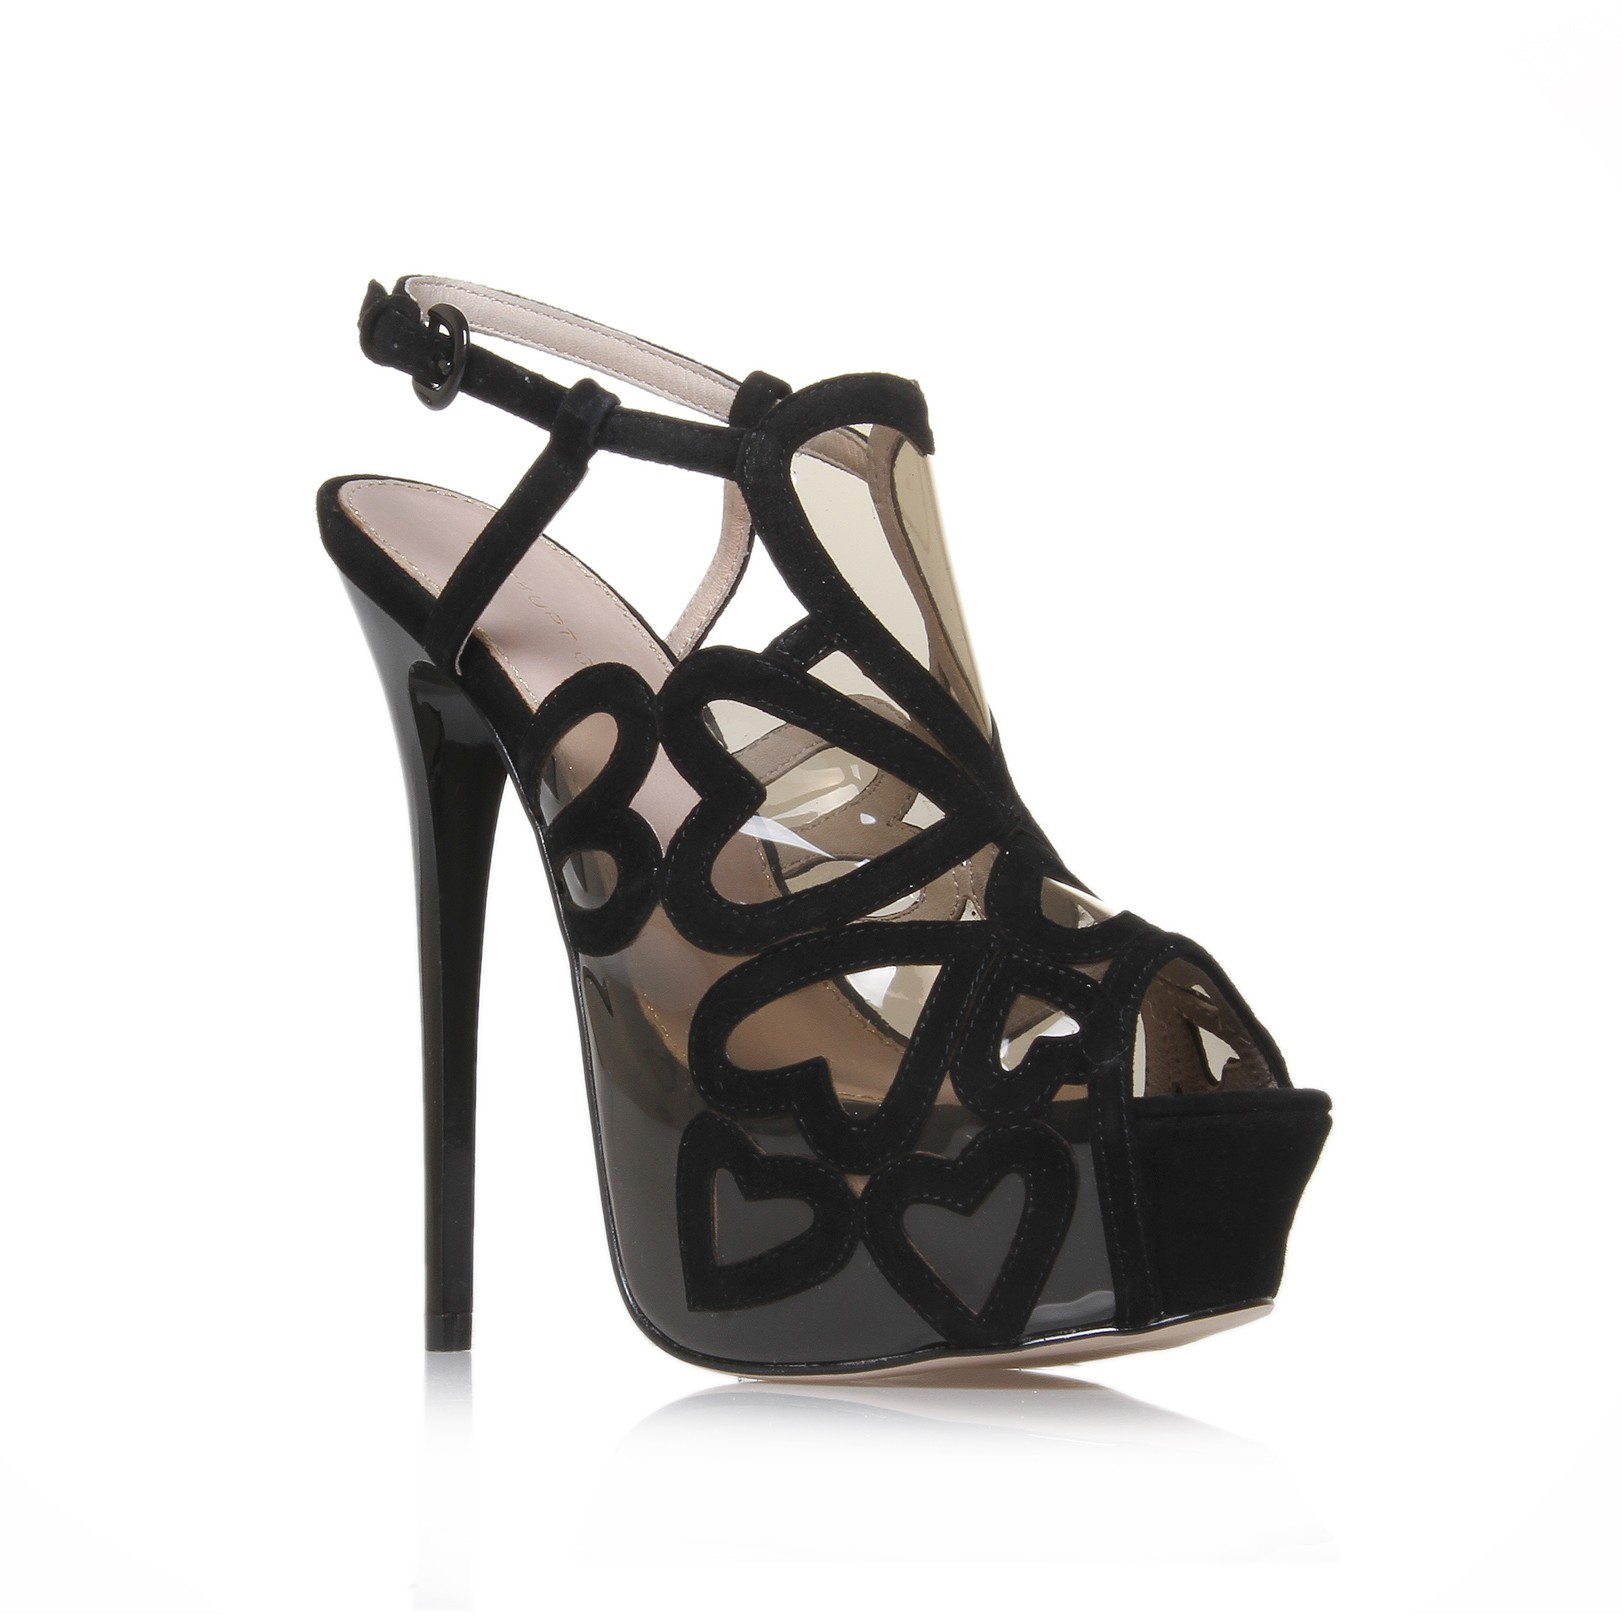 Giuseppe zanotti high heel platforms in motion 5